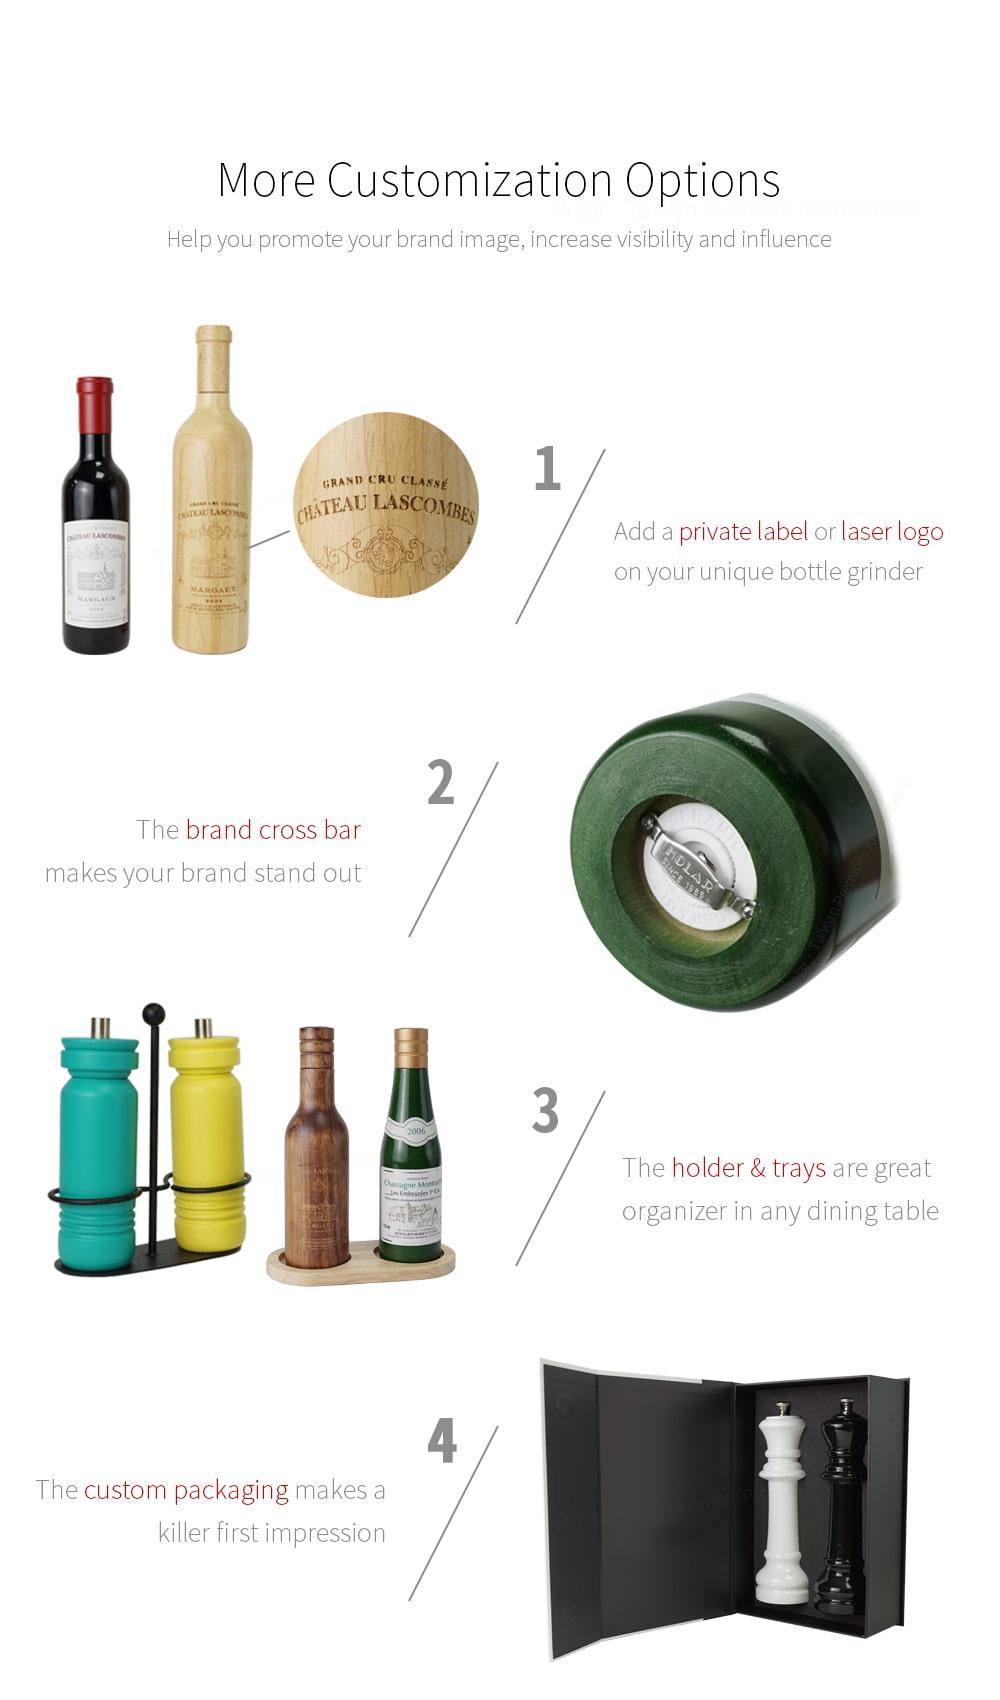 Customized options - Holar wine bottle series